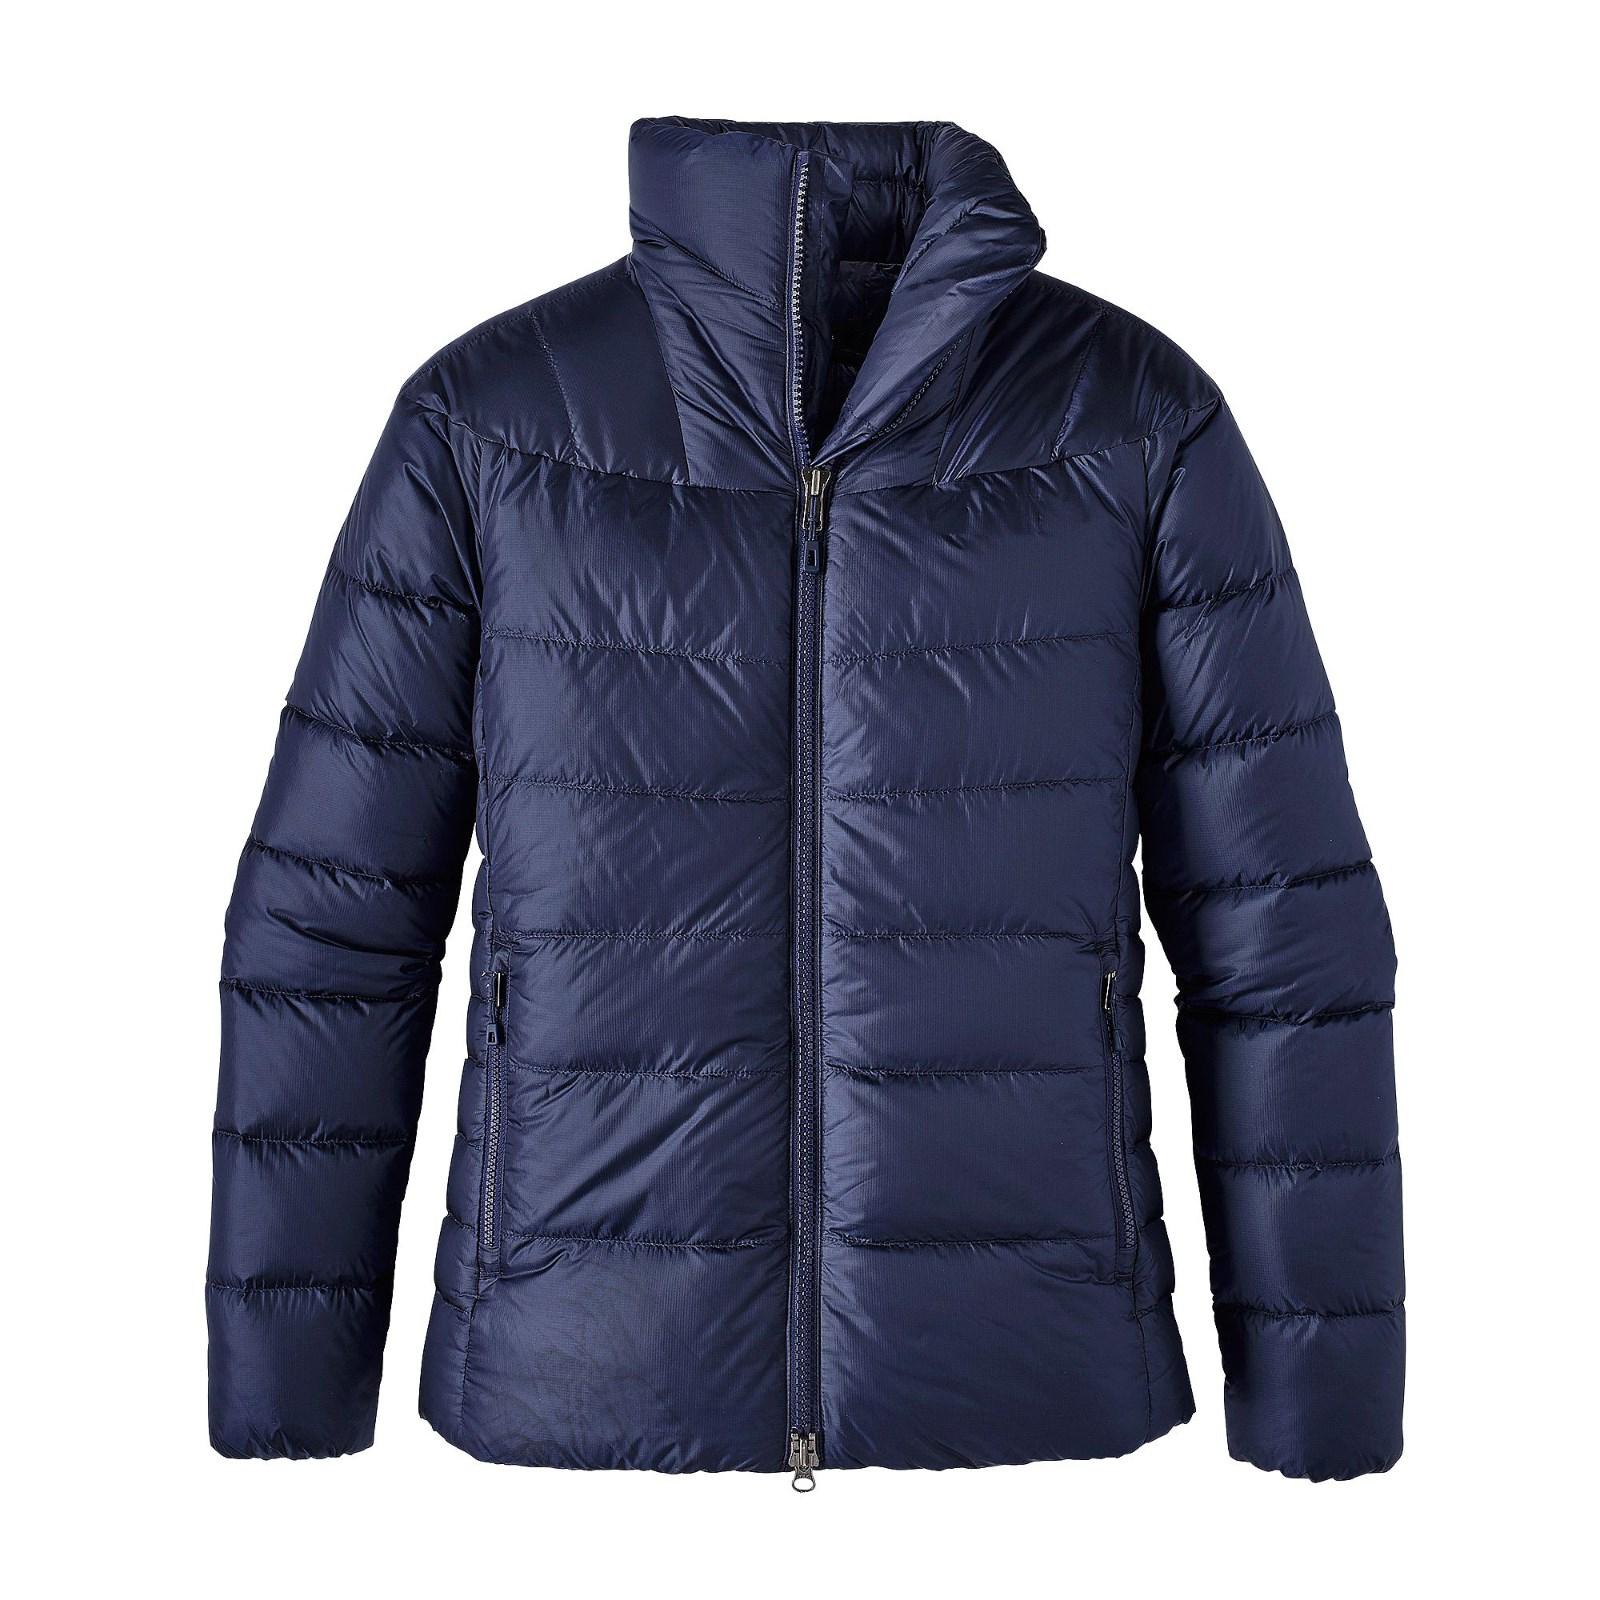 Women's Fitz Roy Down Jacket Manufacturers, Women's Fitz Roy Down Jacket Factory, Supply Women's Fitz Roy Down Jacket